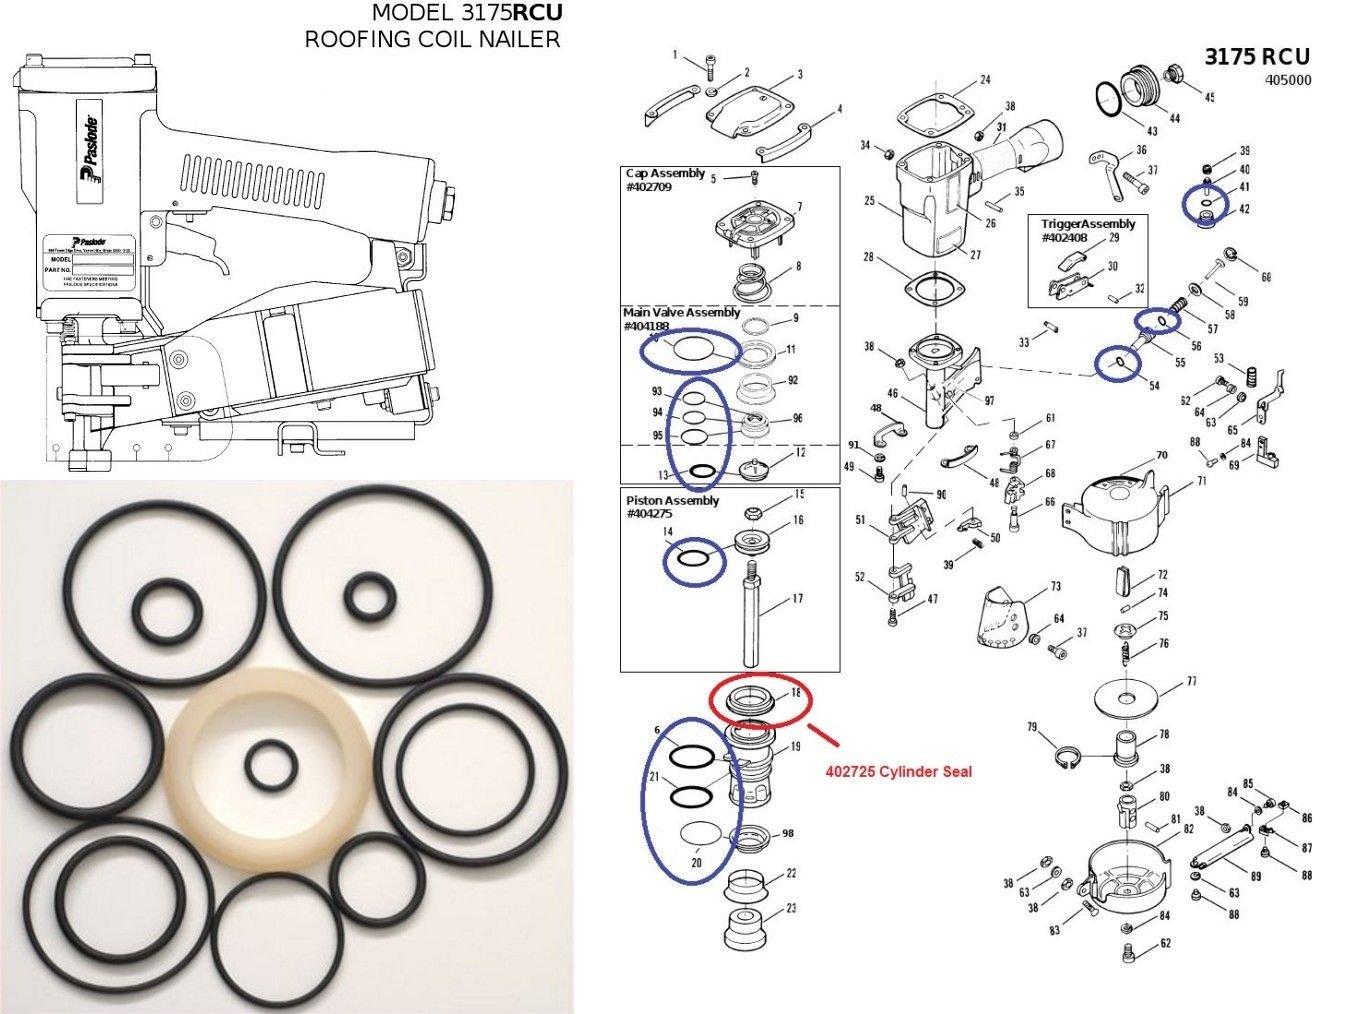 Cylinder Seal 402725 Paslode Stapler 501230 S16//W16 O-Ring Kit